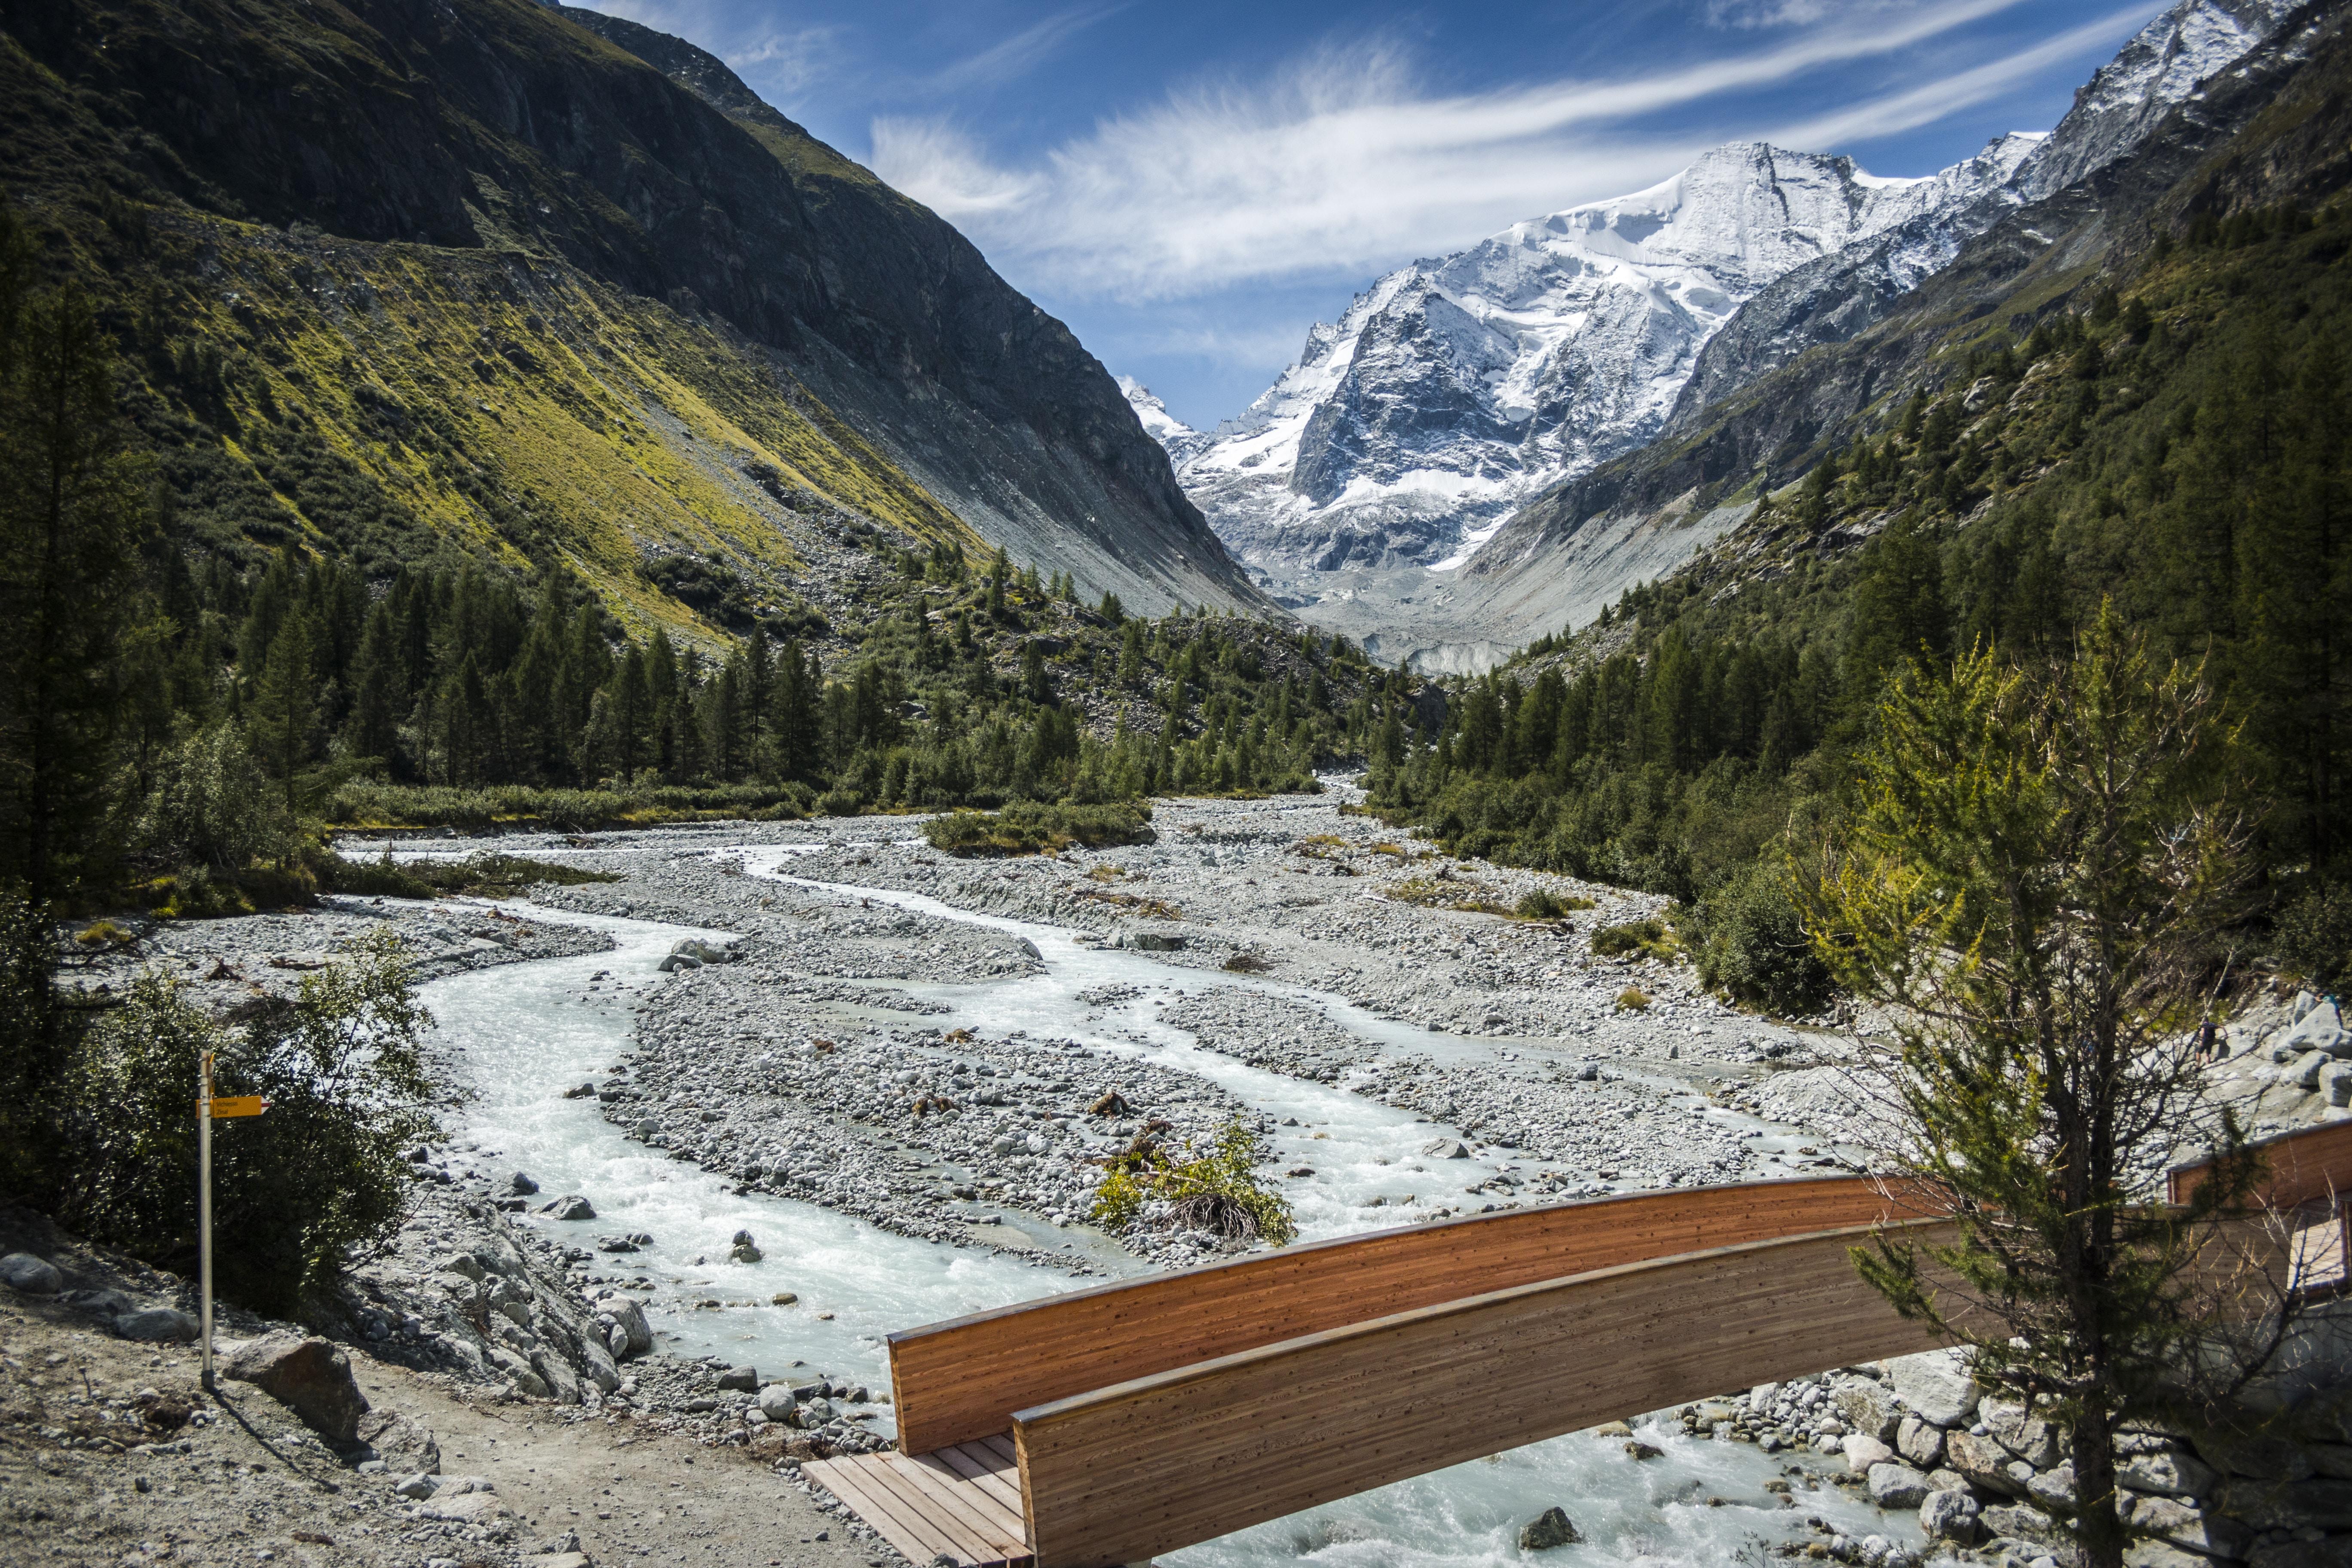 gray rocks and bod of water below brown wooden bridge